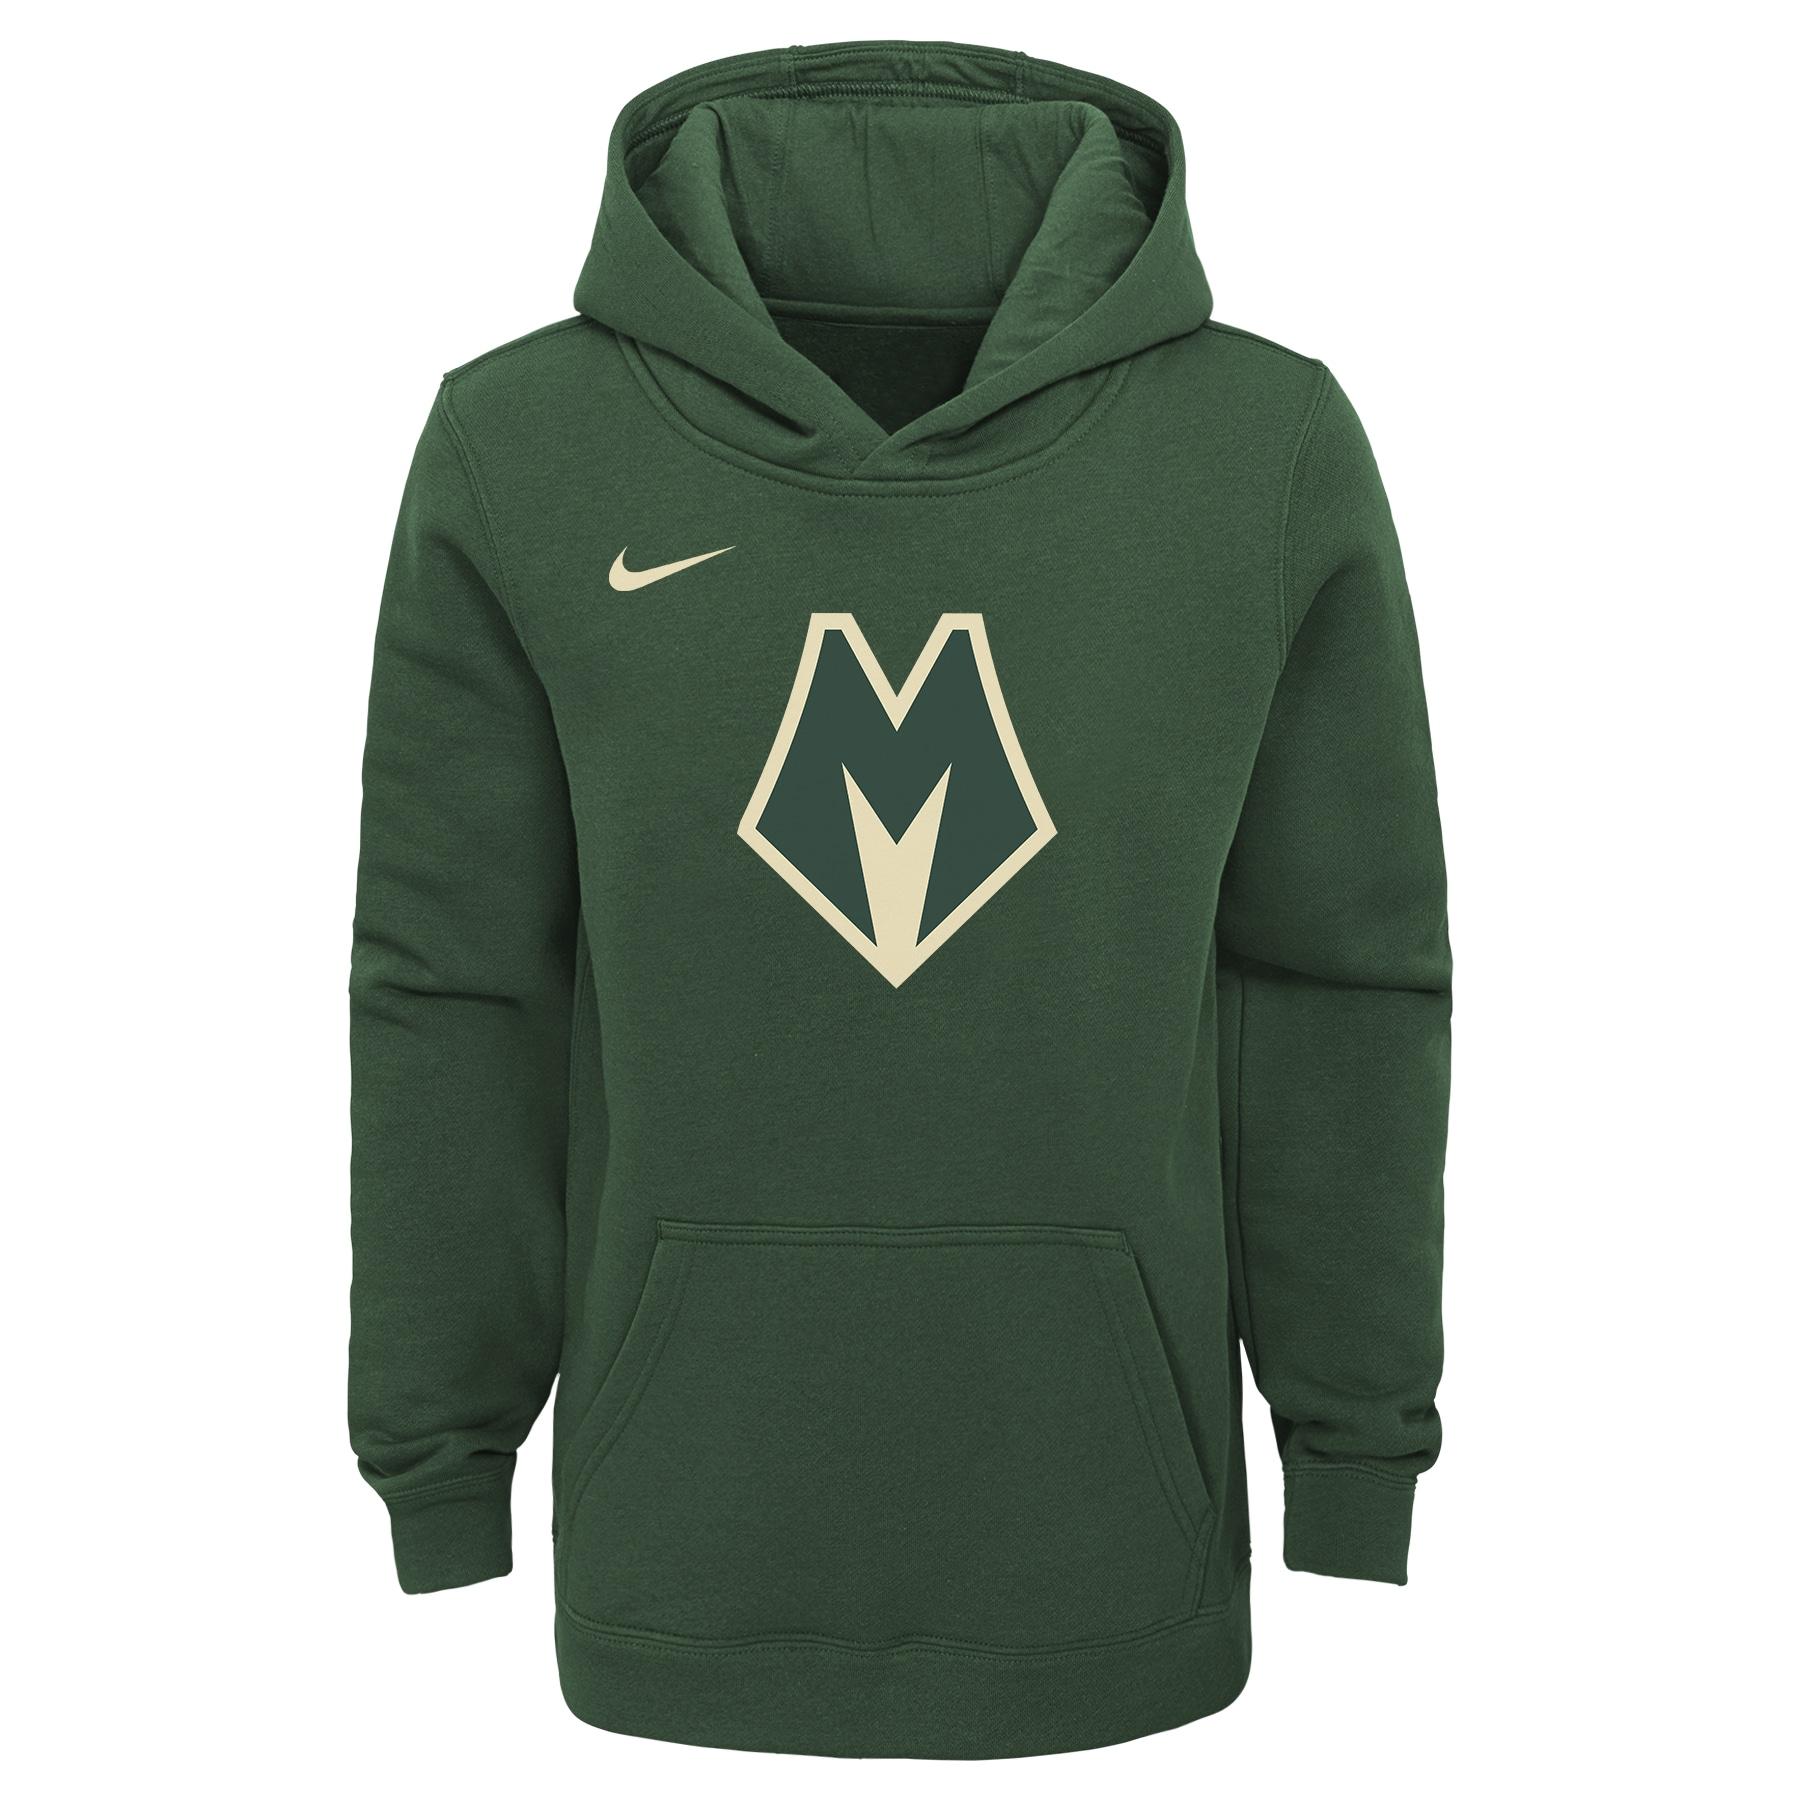 Milwaukee Bucks Nike Youth 2019/20 City Edition Club Pullover Hoodie - Green